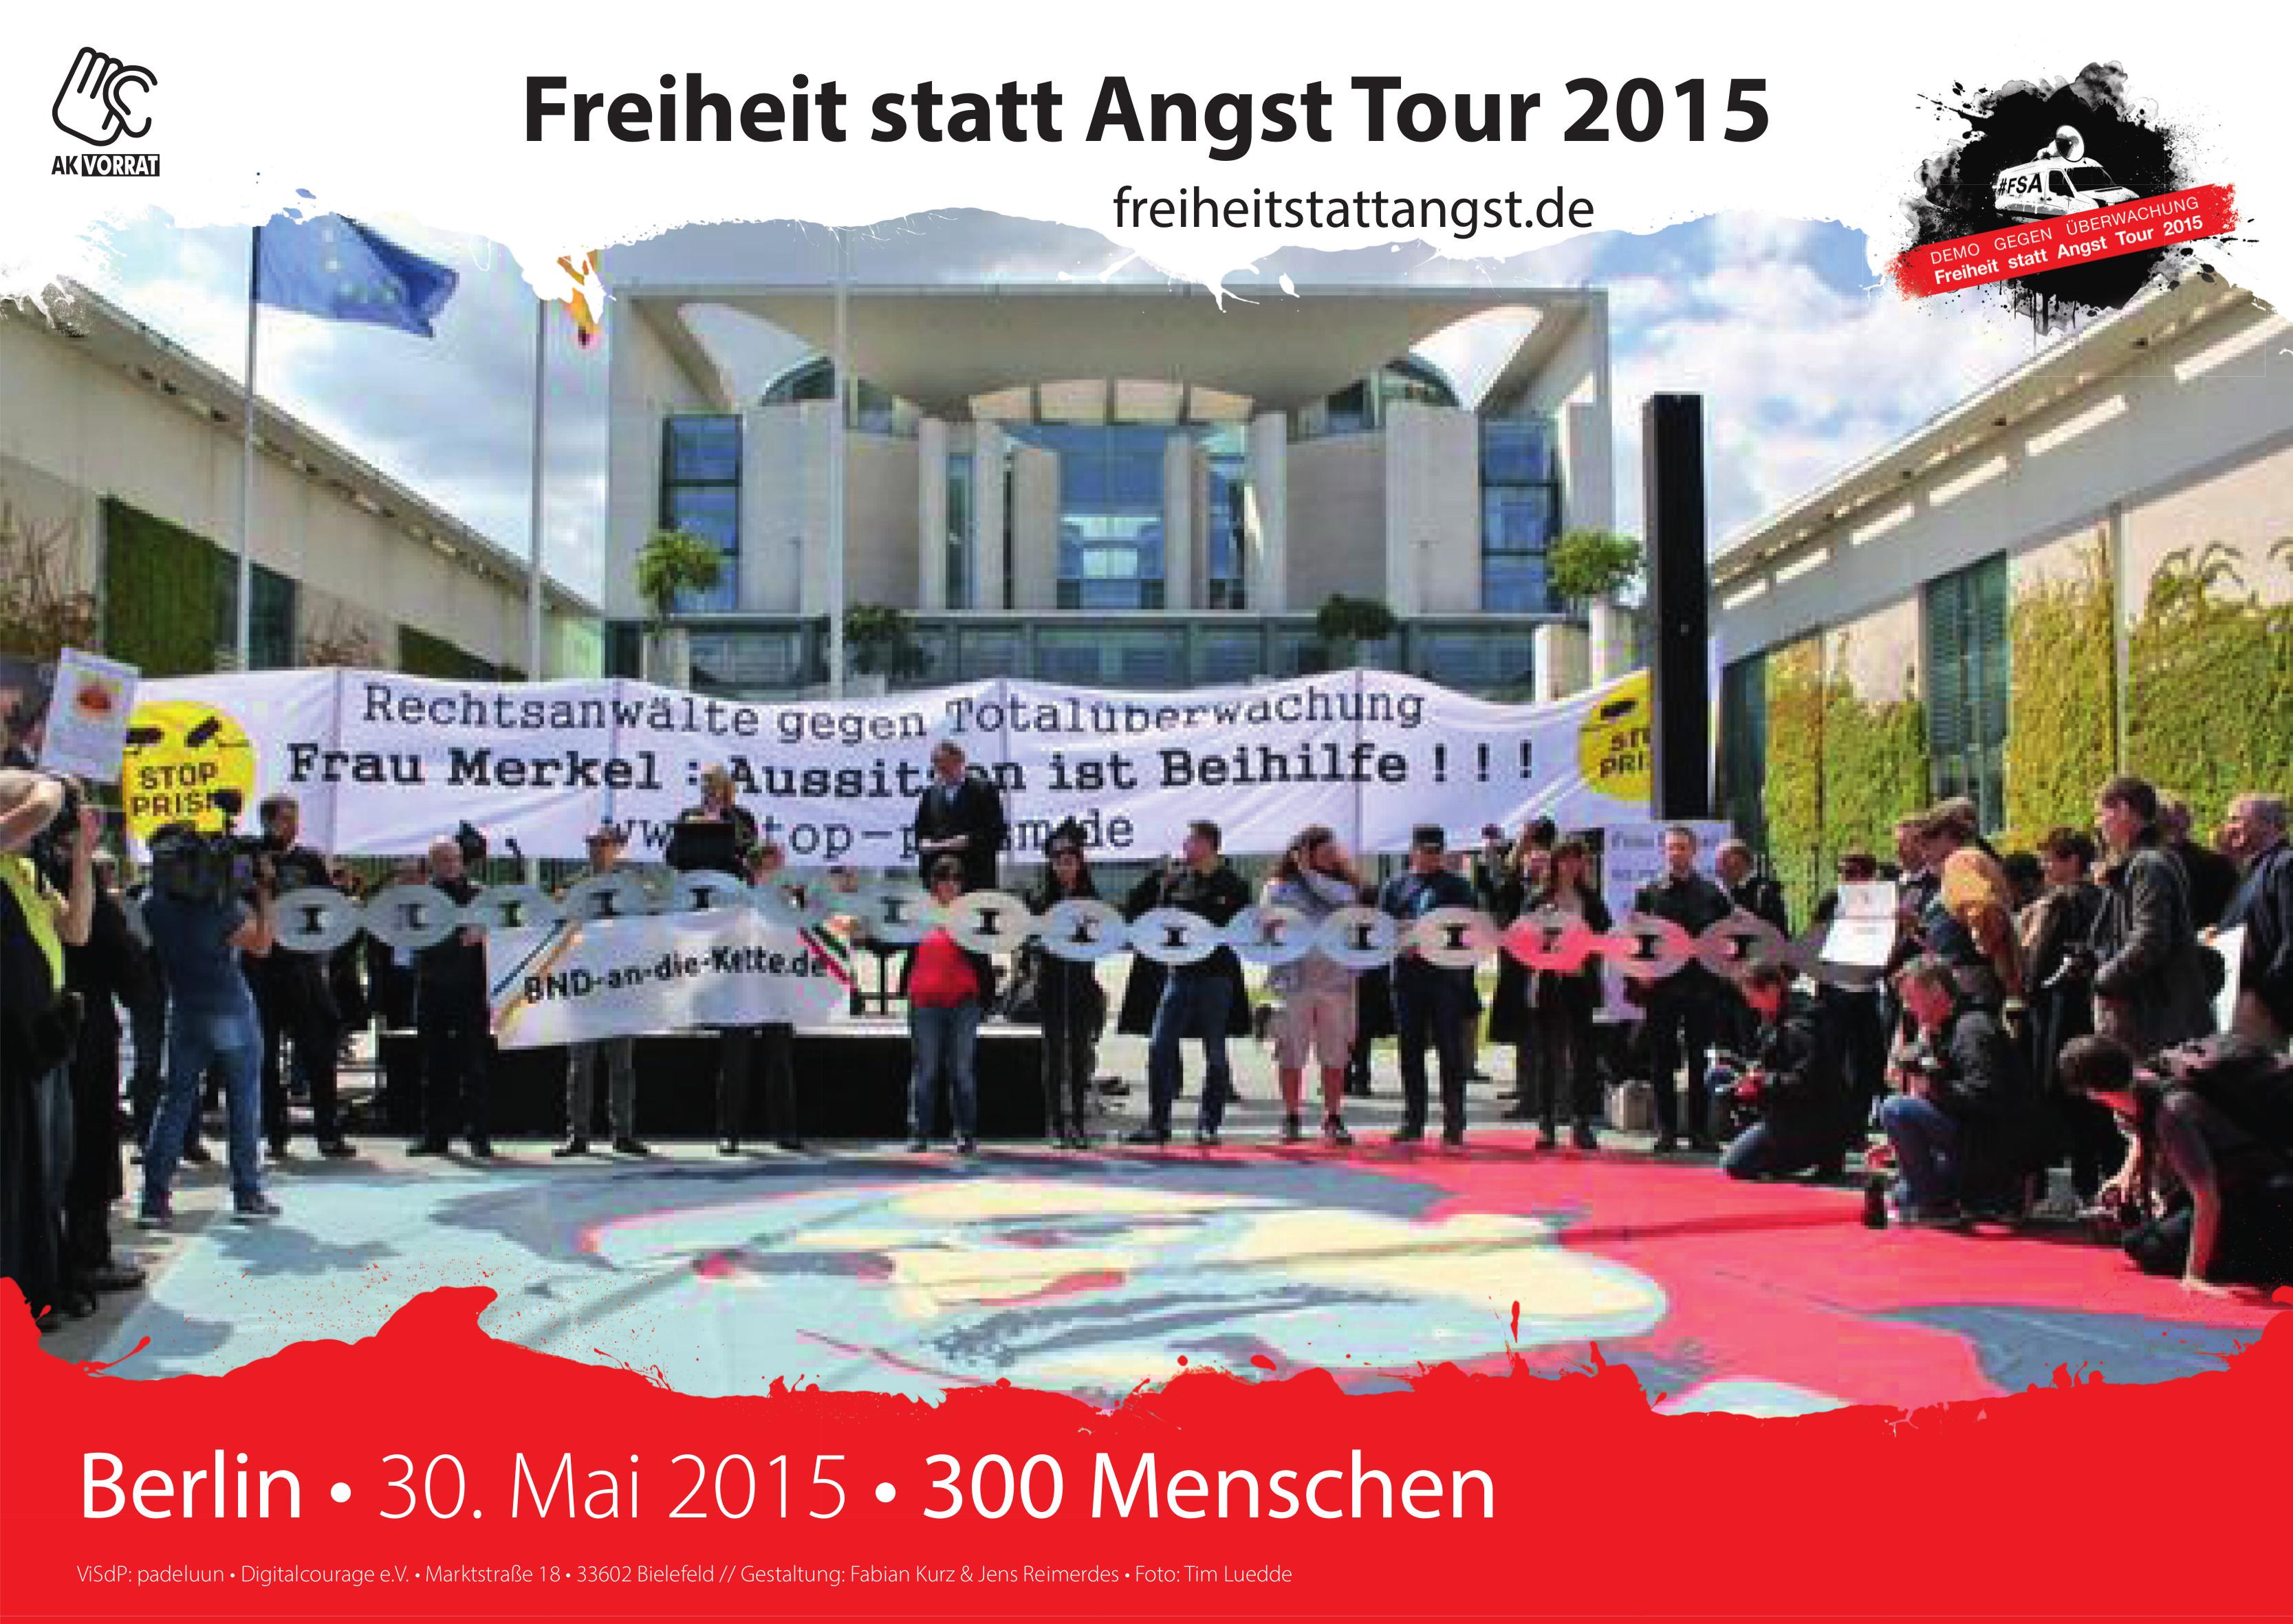 Erste Berlin-Station am 30. Mai 2015. Hauptfokus Rechtsanwälte.